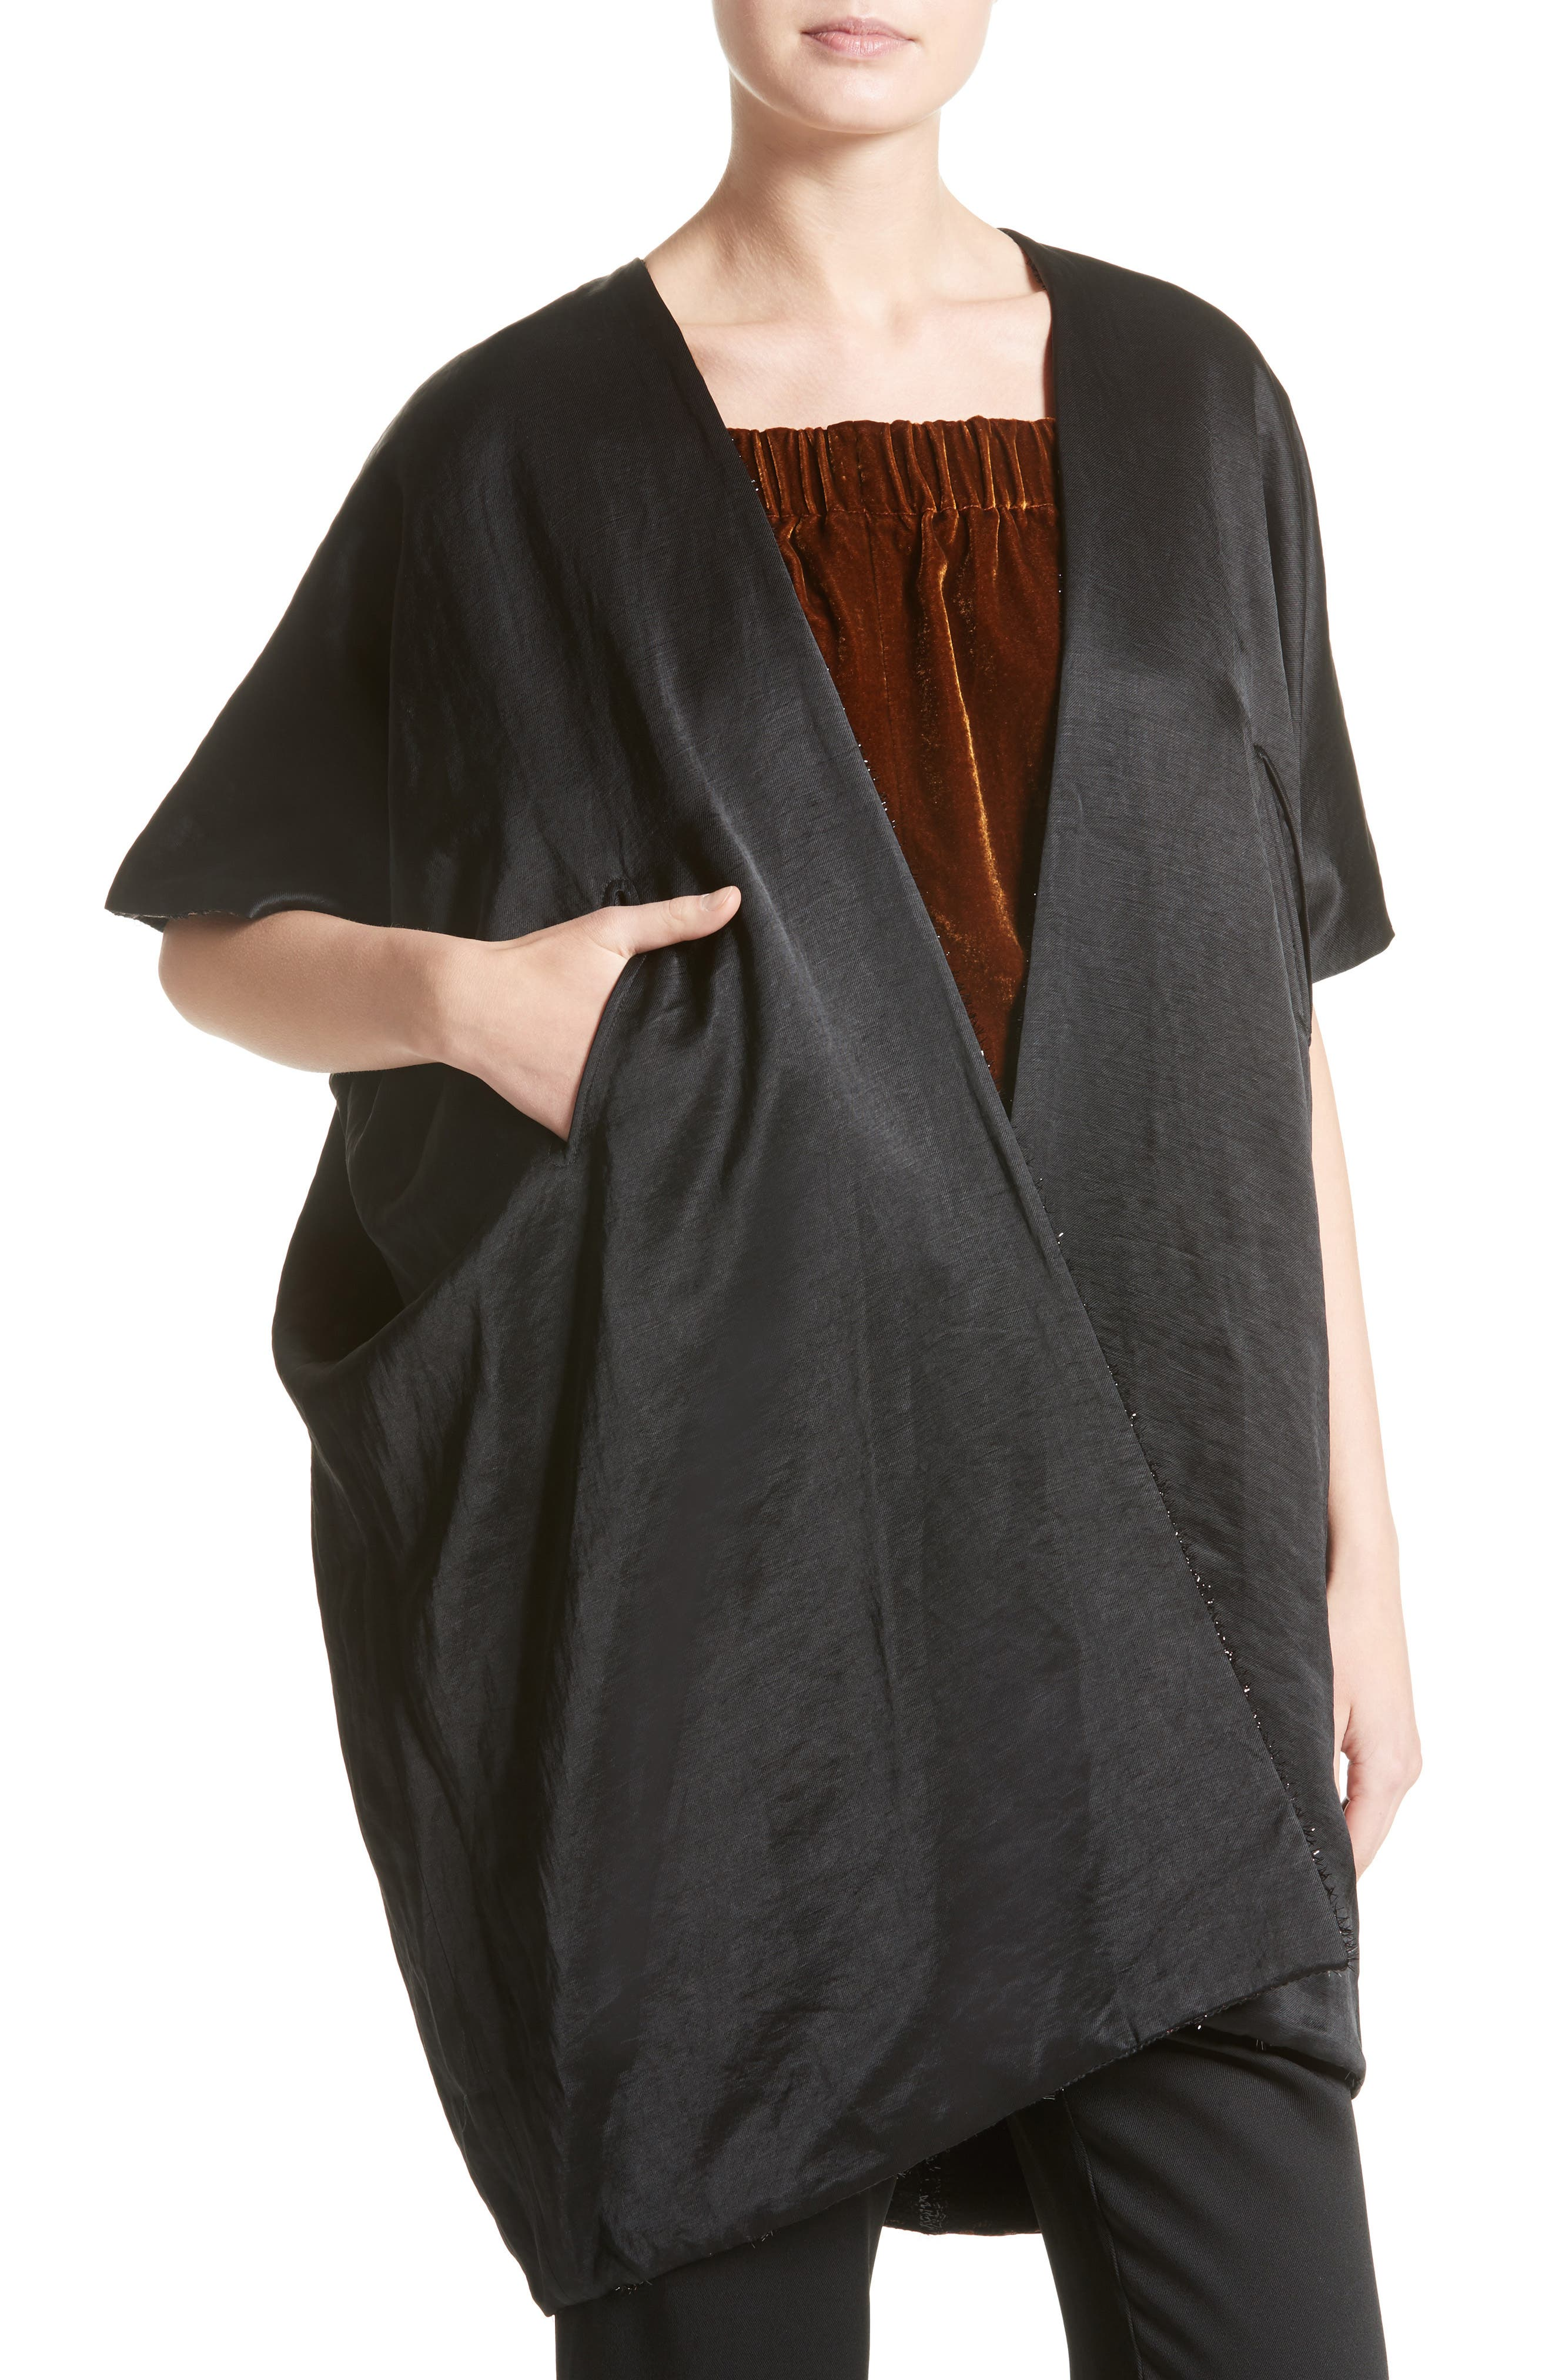 Gaban Reversible Jacquard Coat,                             Alternate thumbnail 4, color,                             200